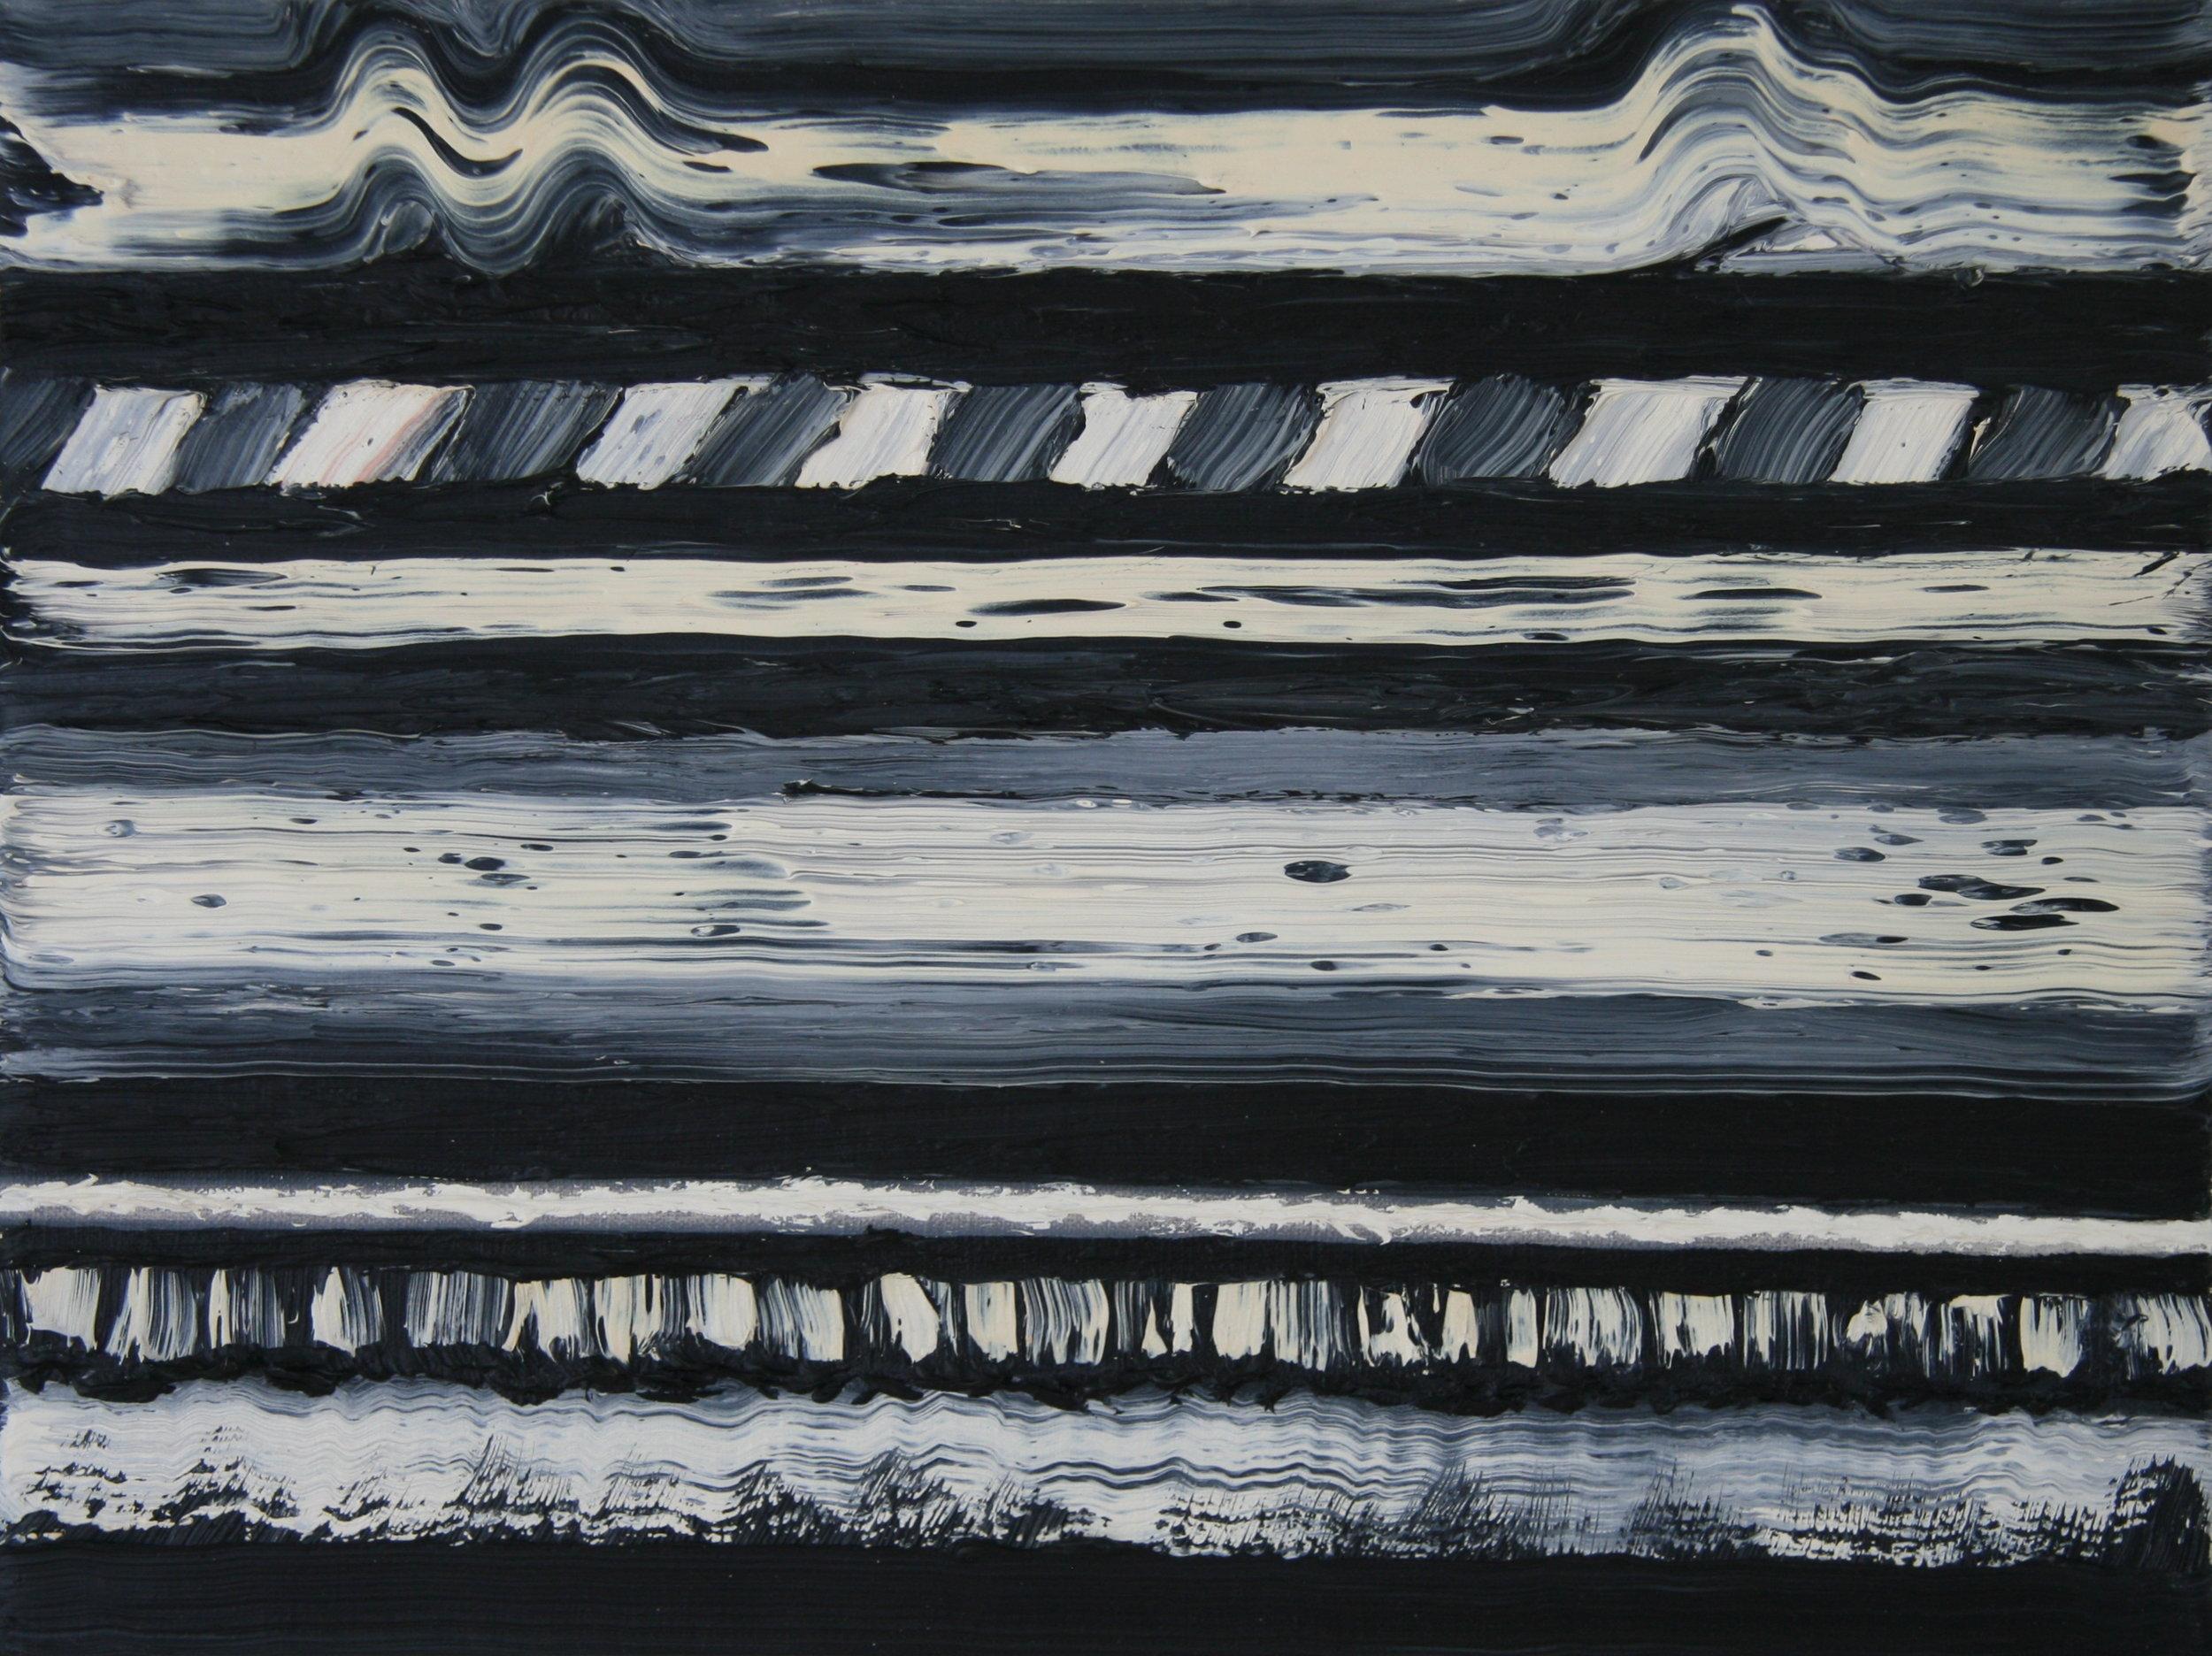 no title, 30x40cm, oil on canvas